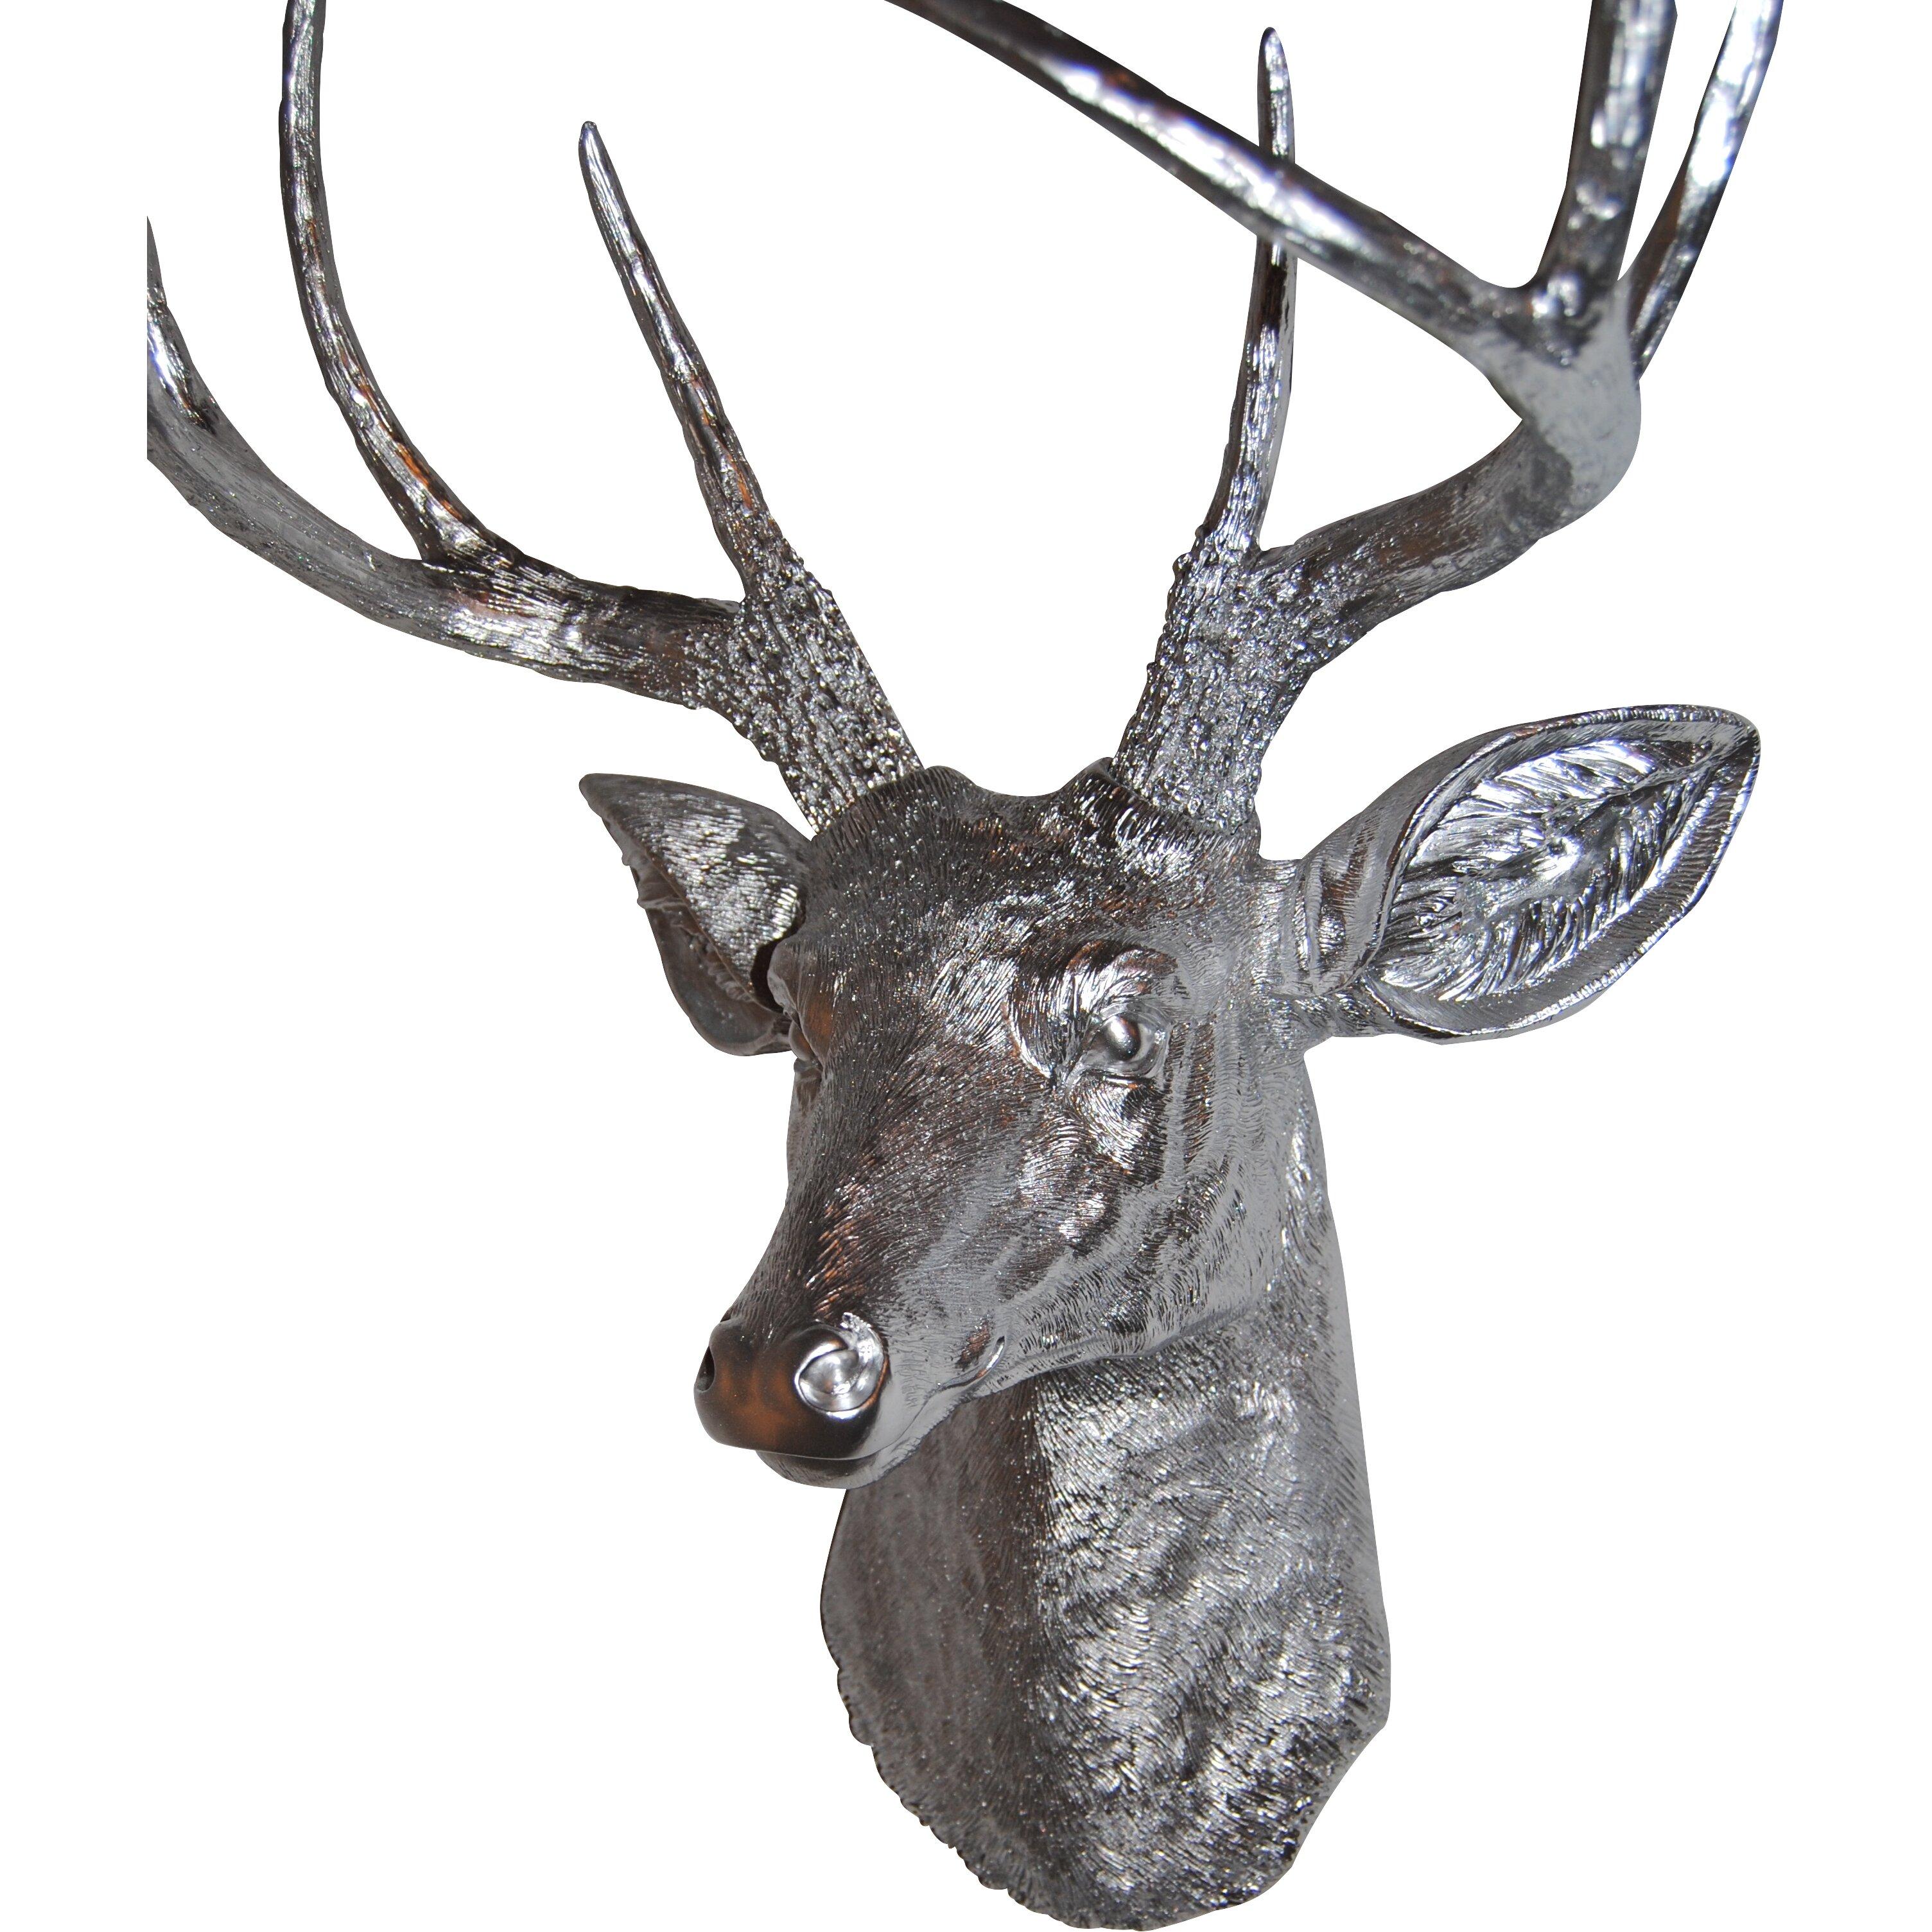 Brayden Studio Large Deer Head Faux Taxidermy Wall D Cor